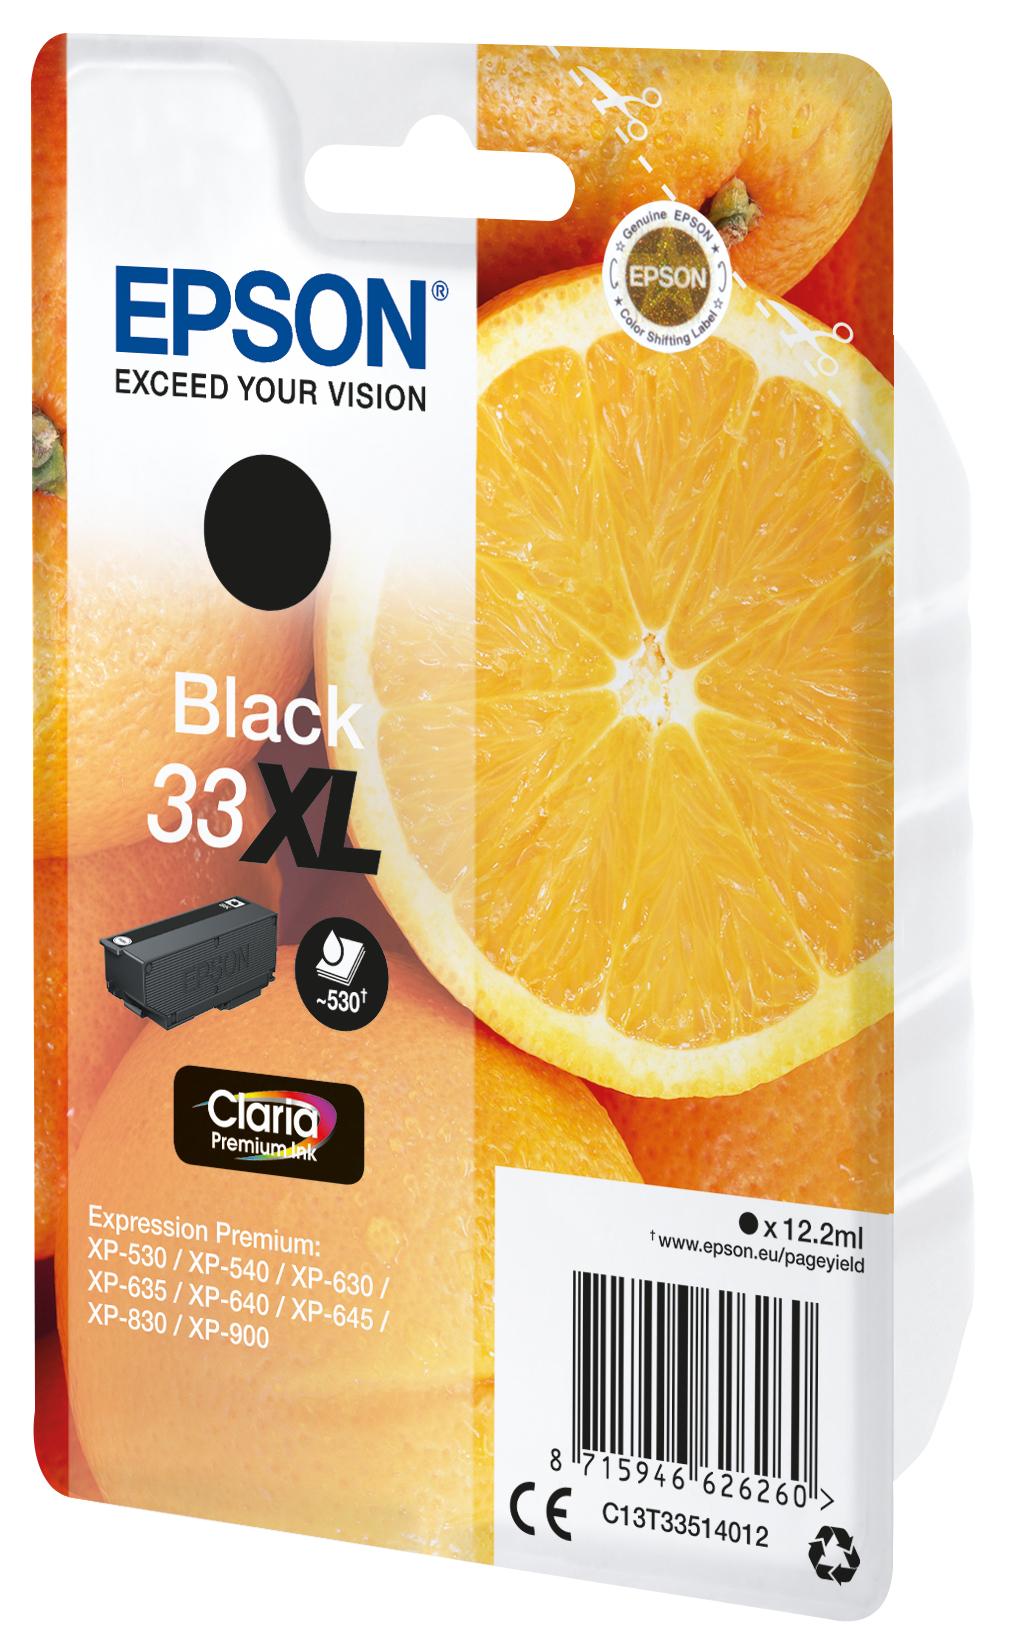 T3351 inkjetcartridge Claria 33 zwart XL (530 afdrukken)